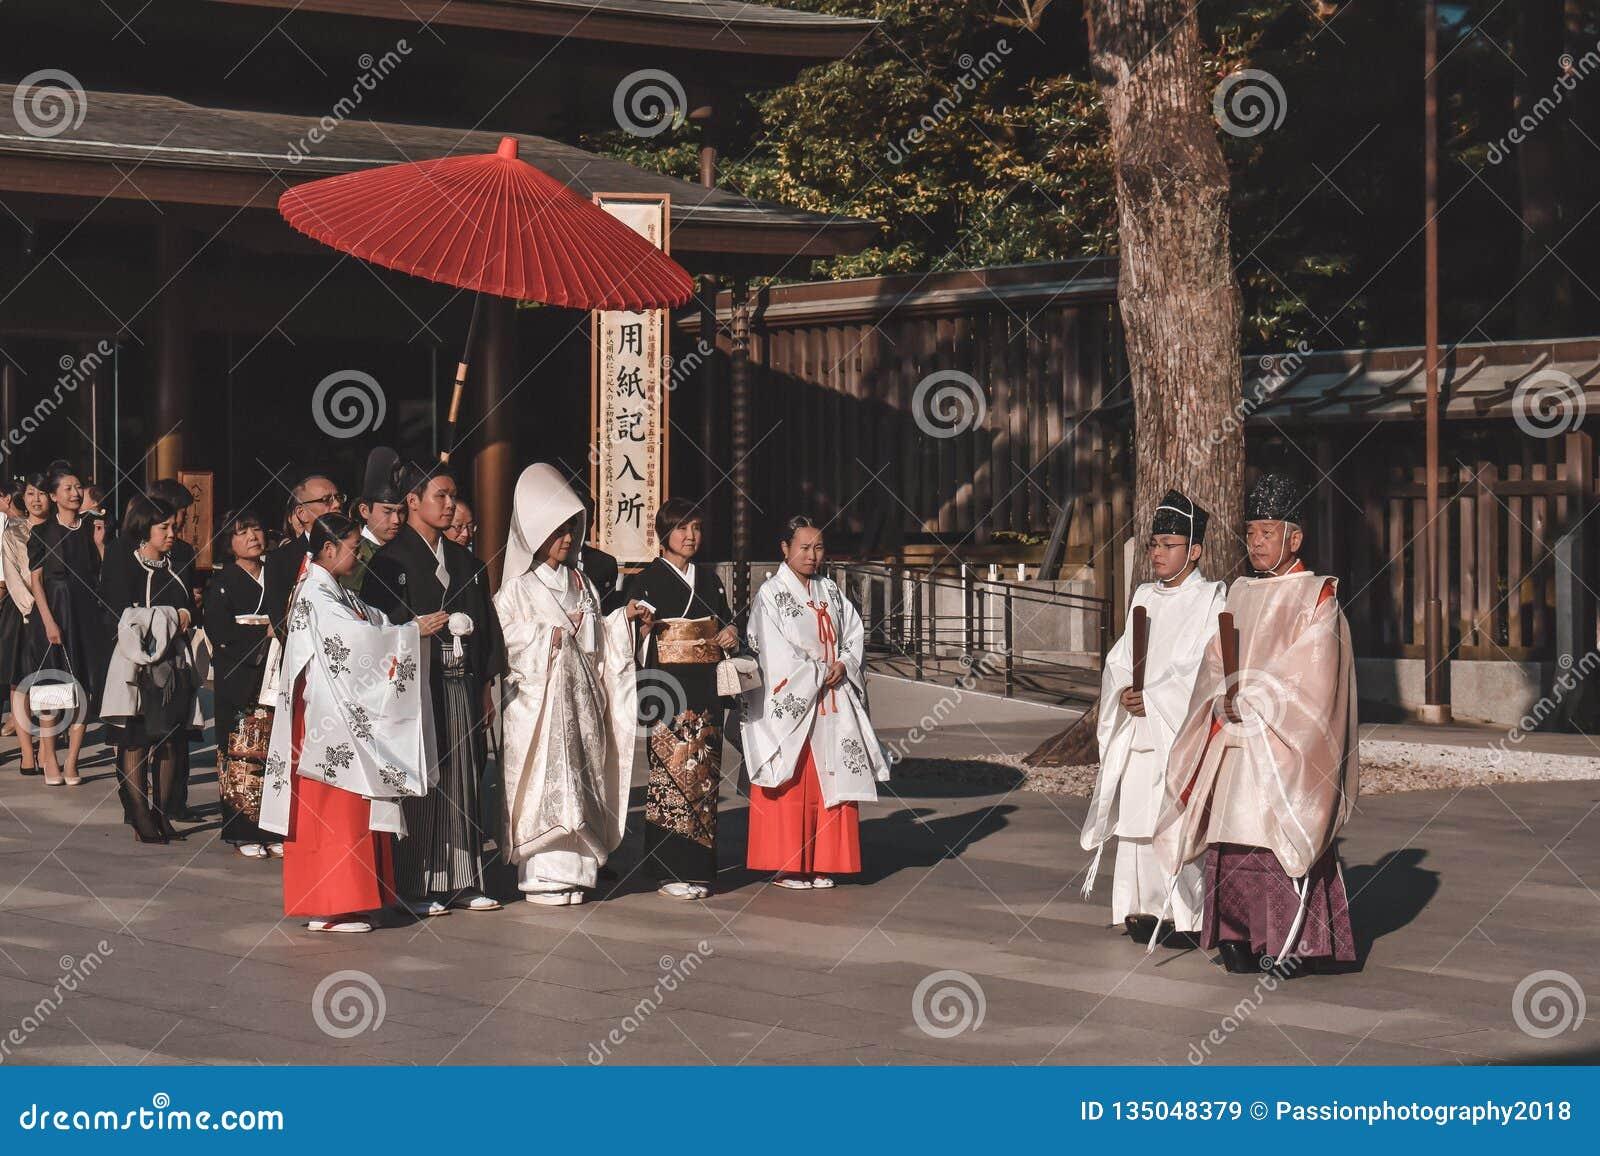 Japanese Wedding Traditions.Traditional Japanese Wedding Ceremony In Kimonos Editorial Stock